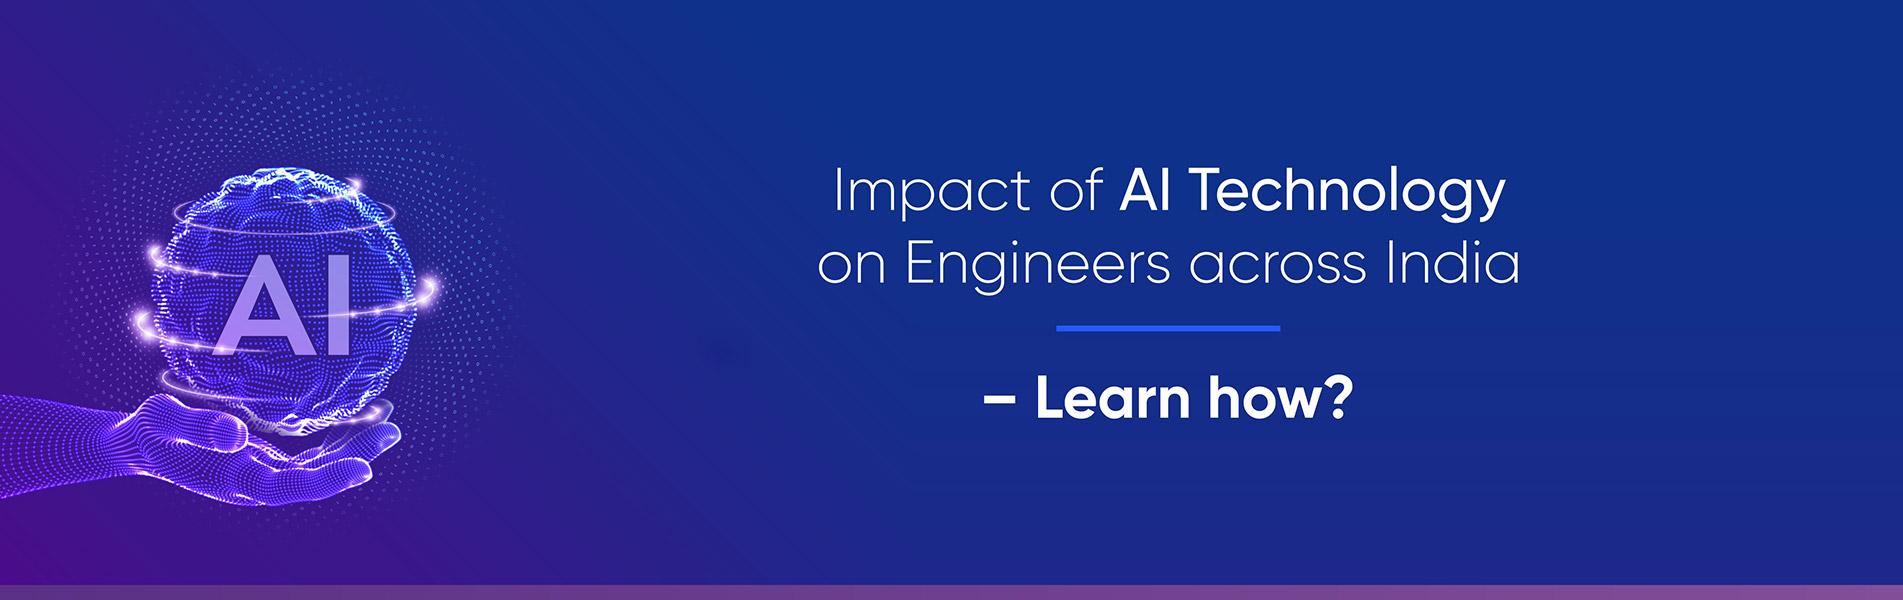 AI Technology, Engineers